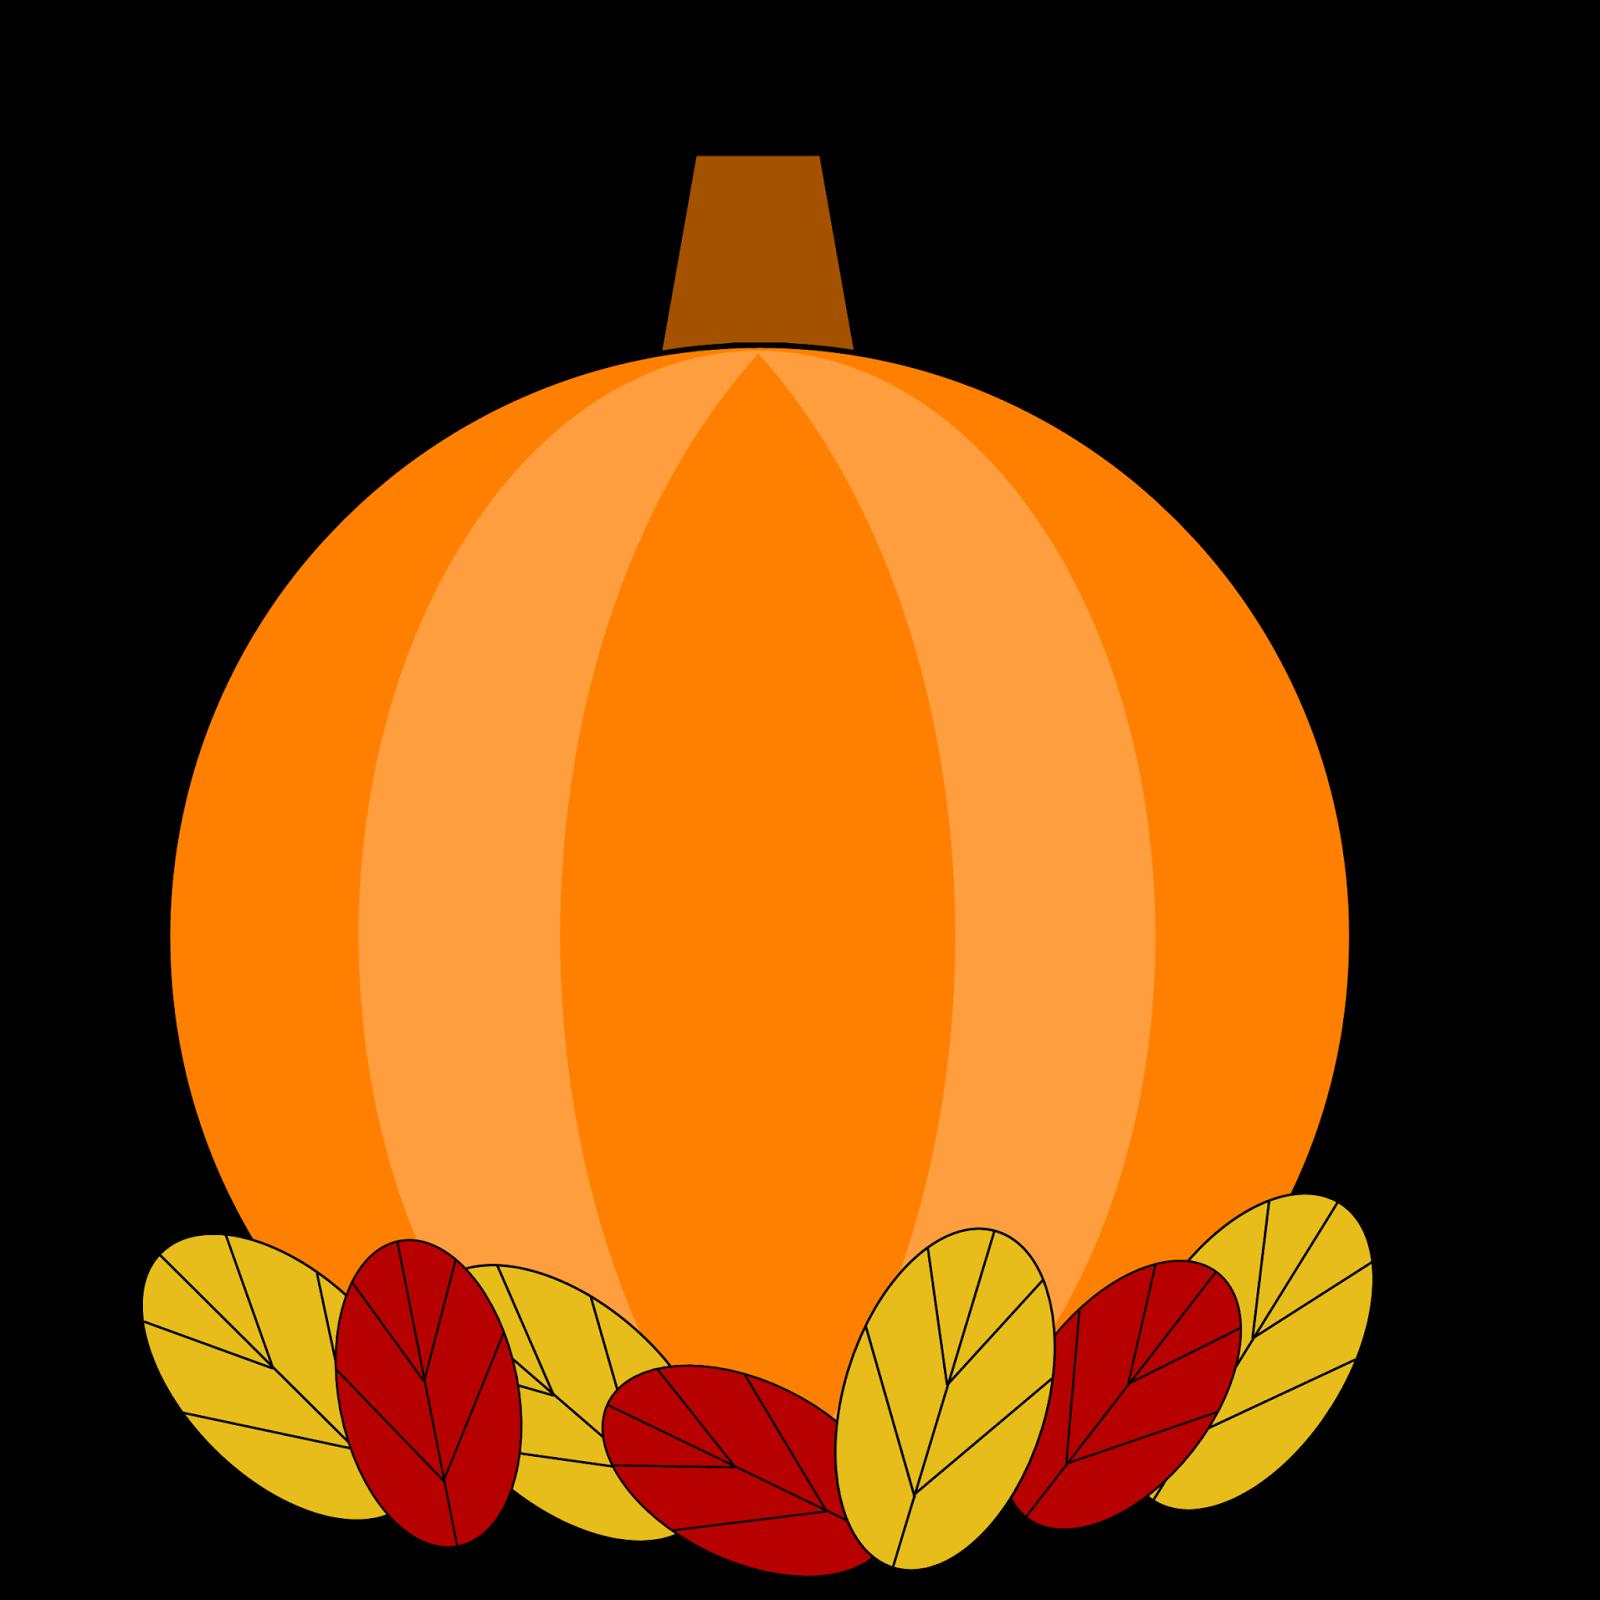 Gray pumpkin leaf clipart clipart freeuse download Free Clipart N Images clipart freeuse download